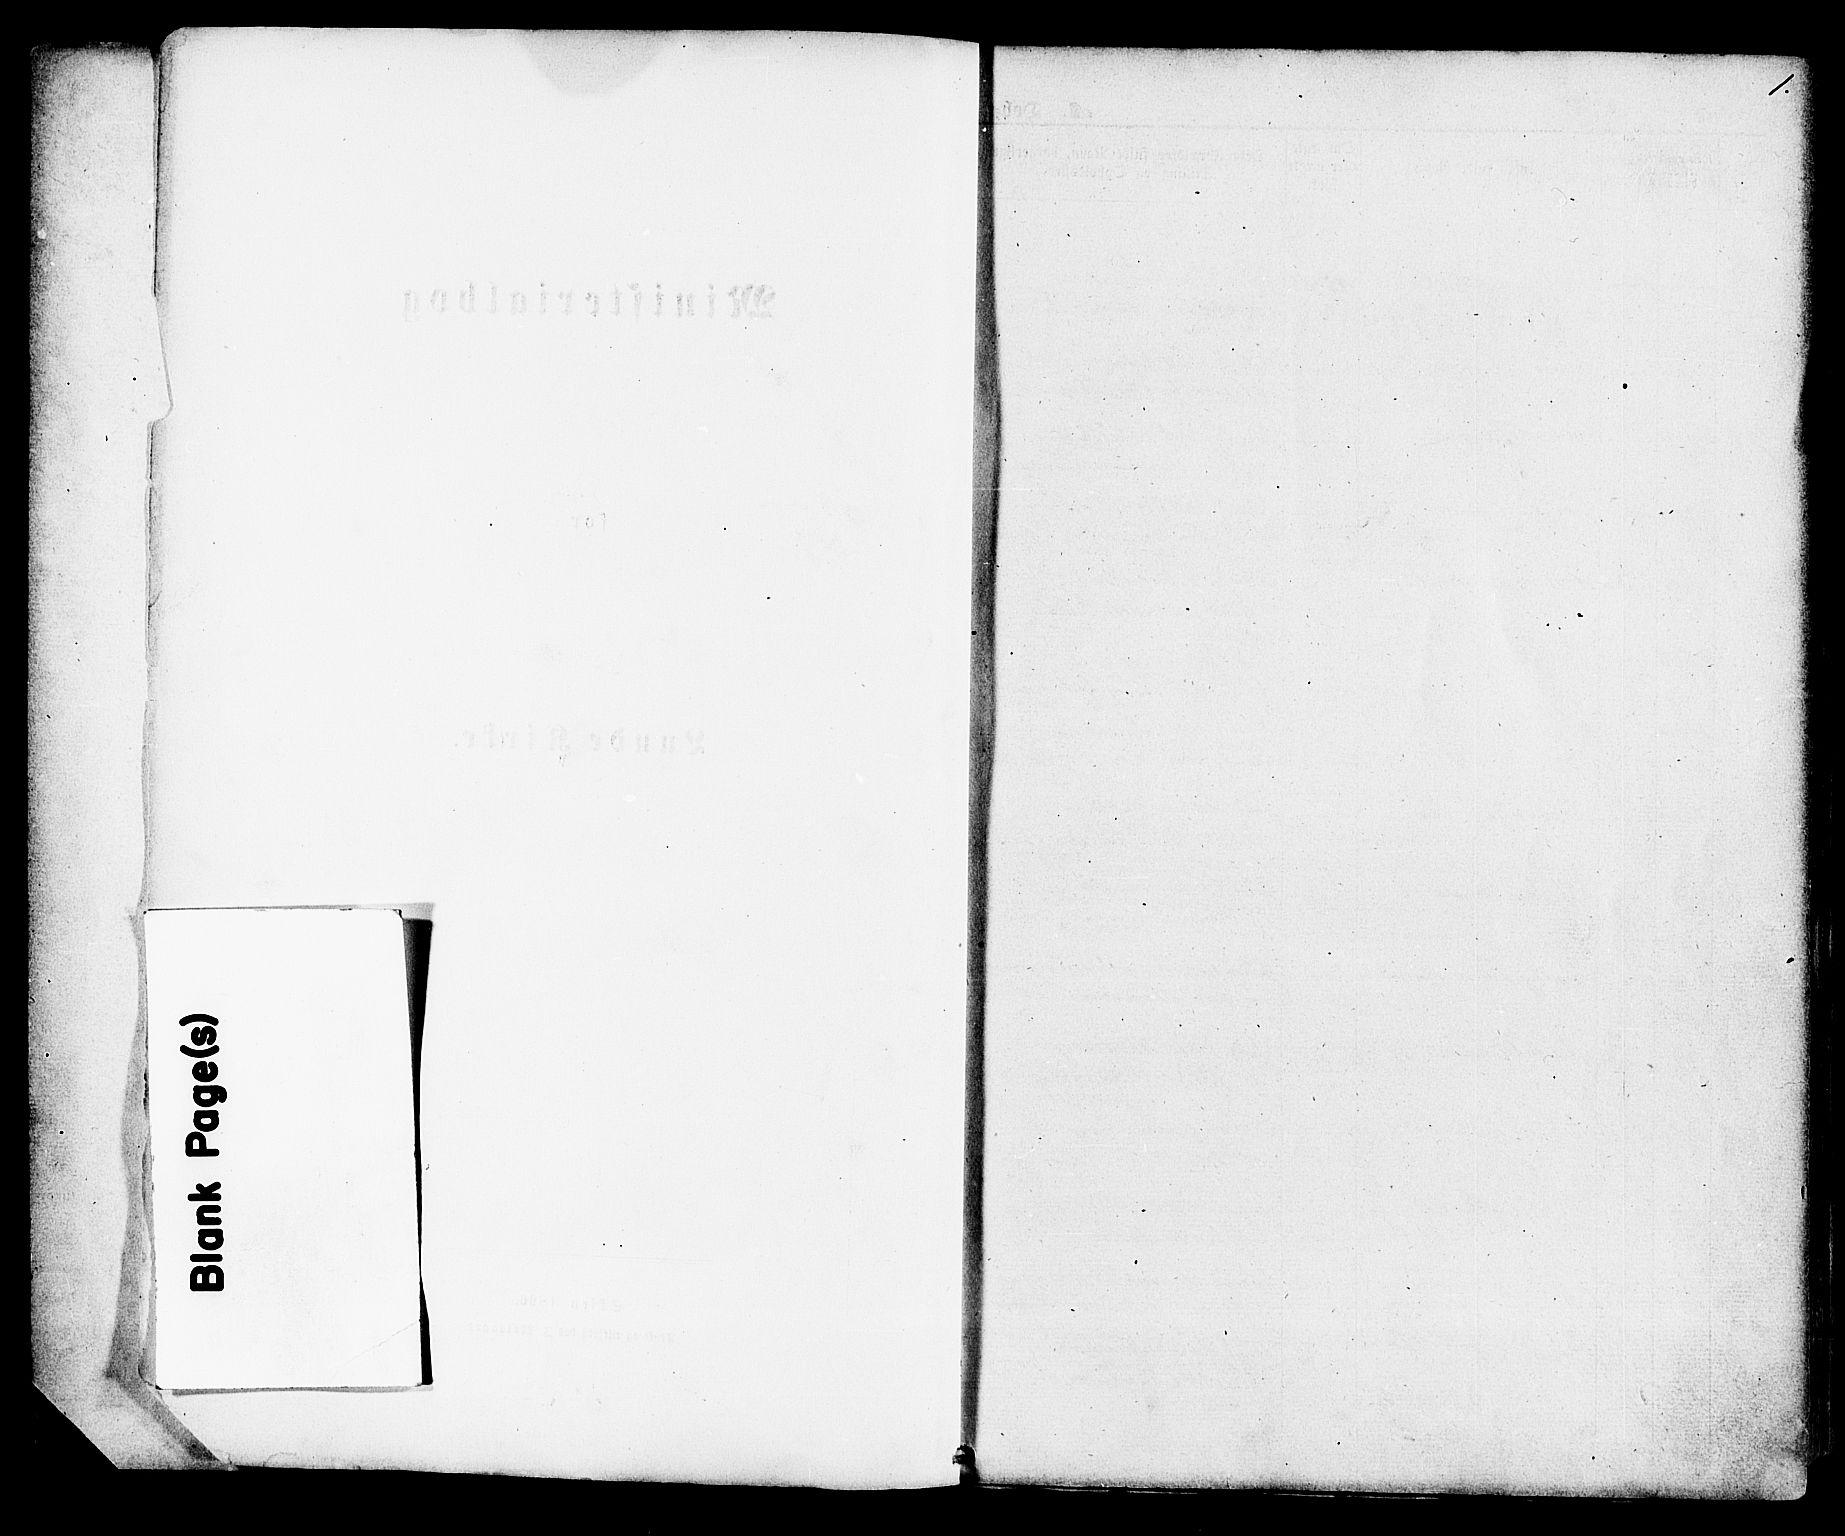 SAKO, Lunde kirkebøker, F/Fa/L0001: Ministerialbok nr. I 1, 1866-1883, s. 1